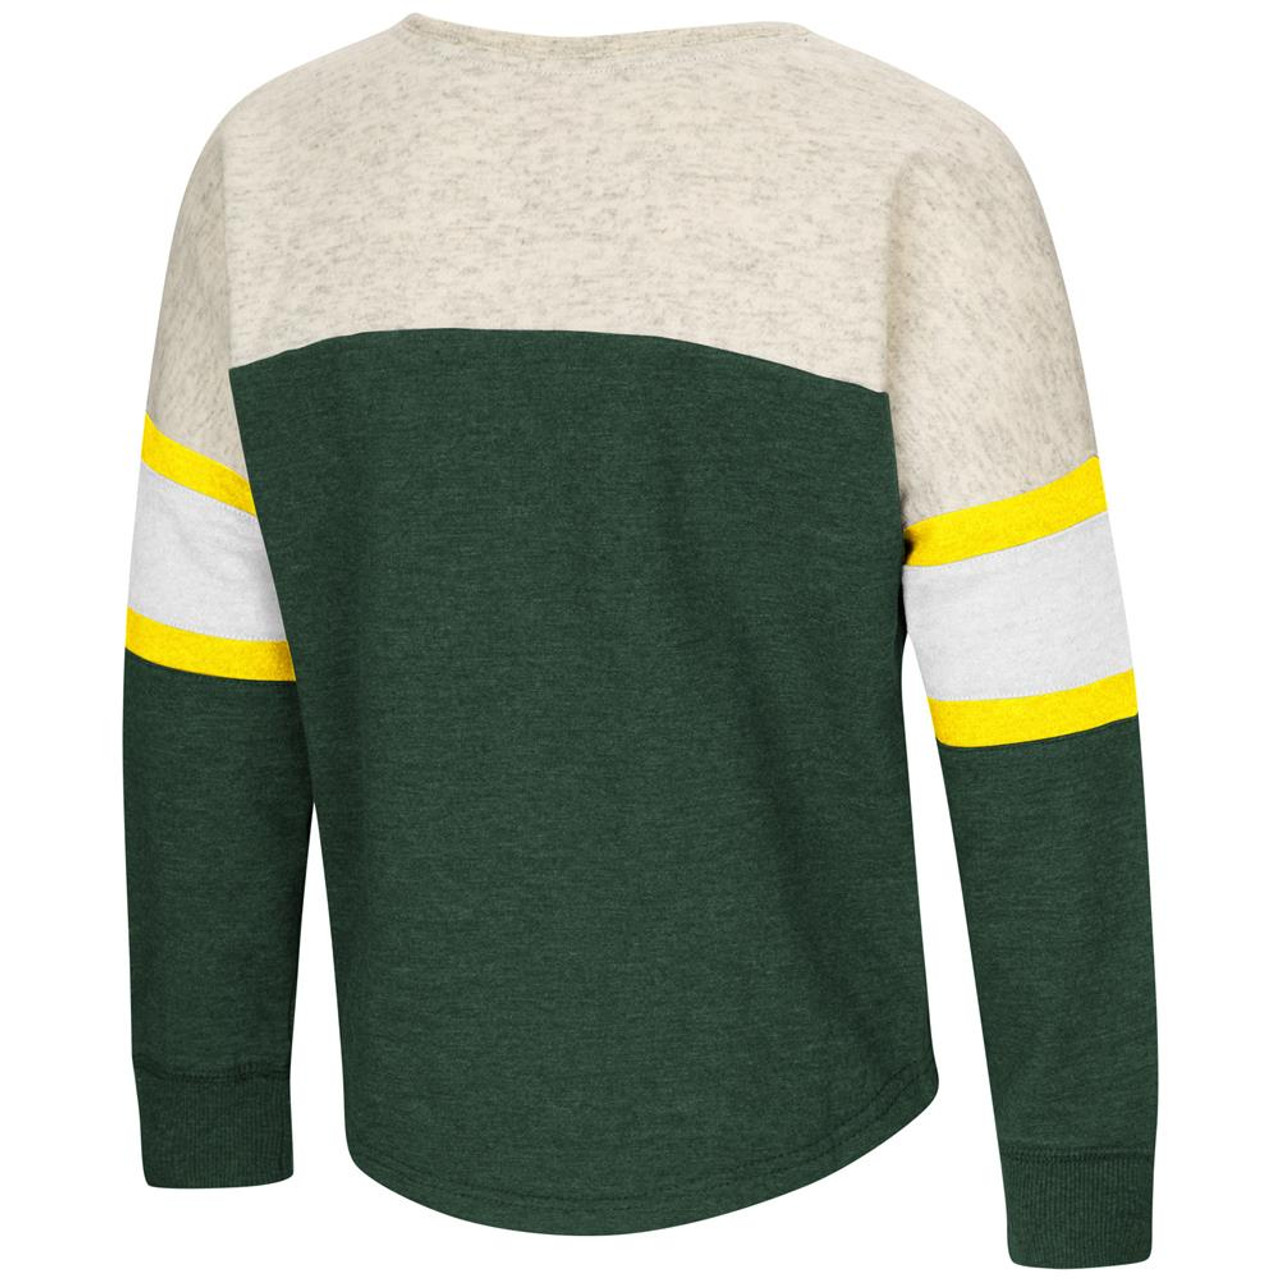 University of Oregon Ducks Girls Sweatshirt Oversized Pullover